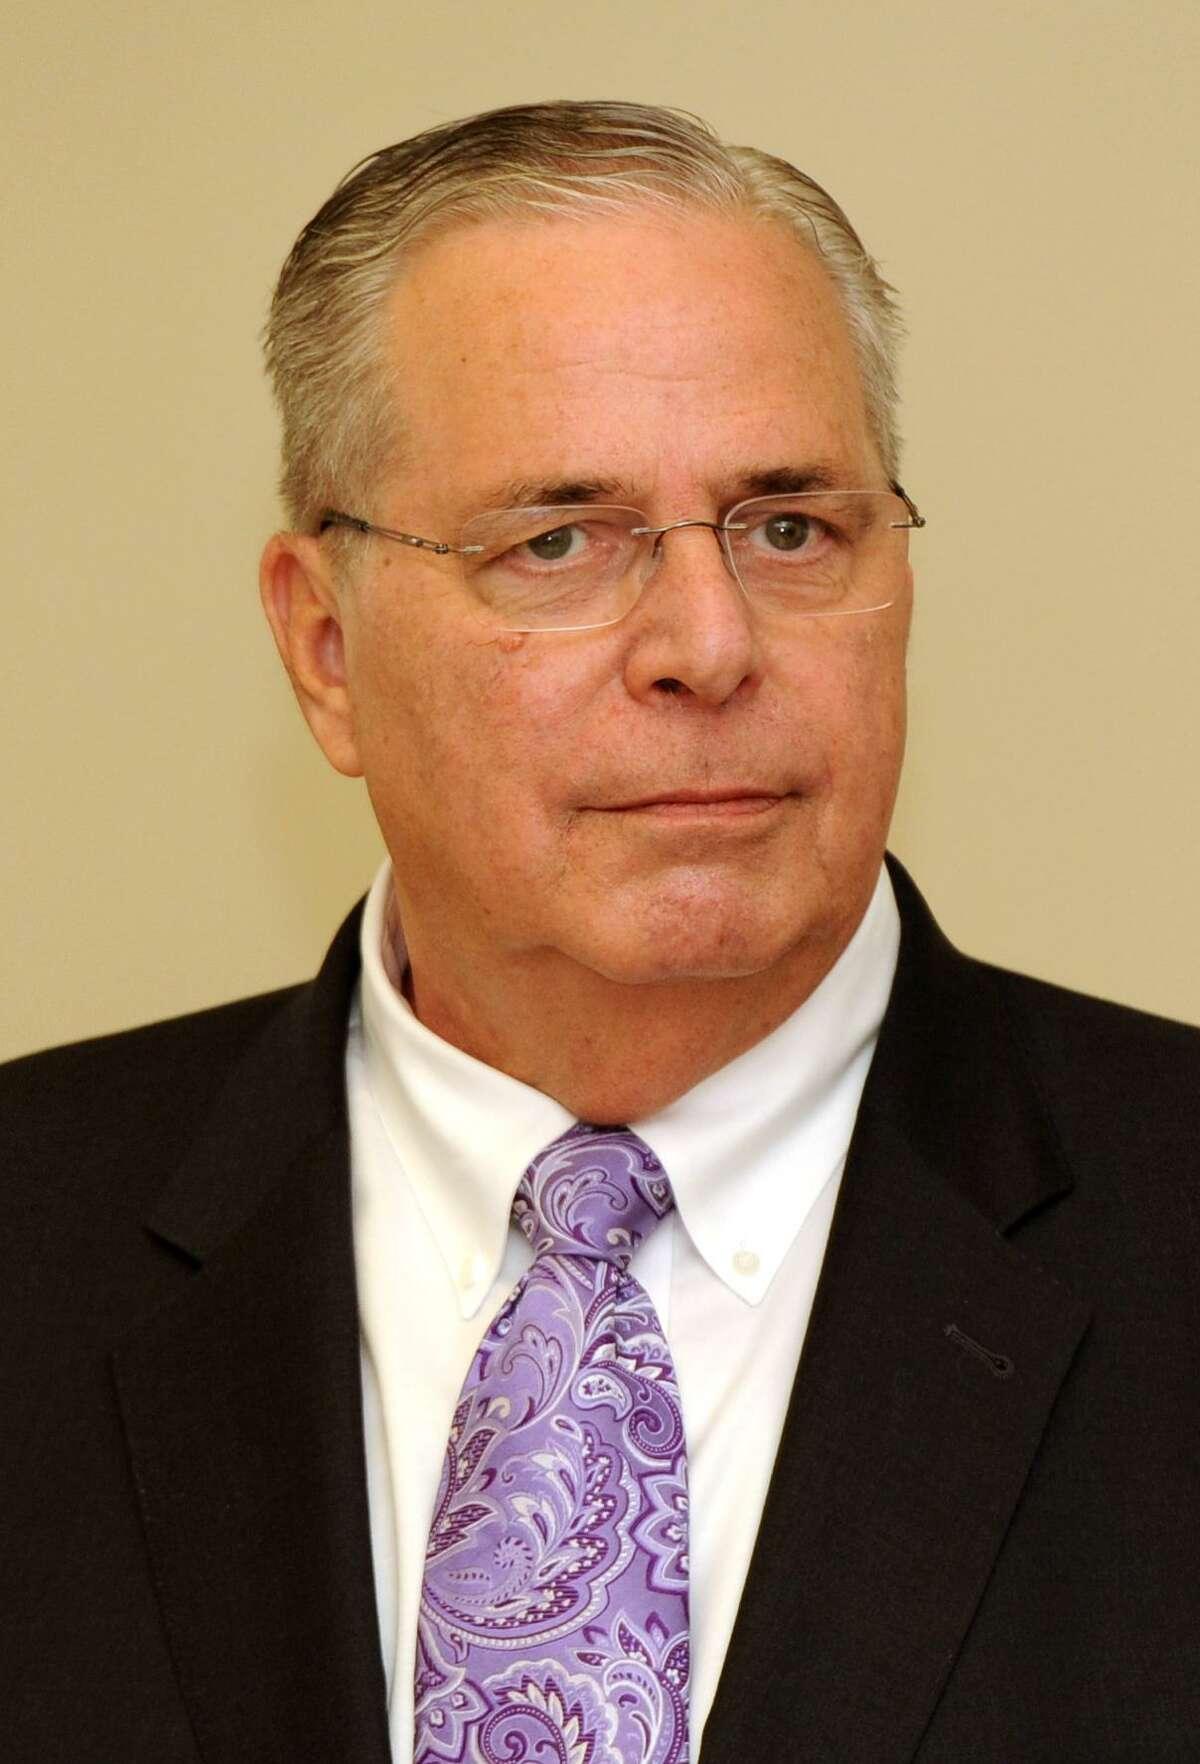 University of Bridgeport President Neil Salonen announced his retirement effective June 2018.